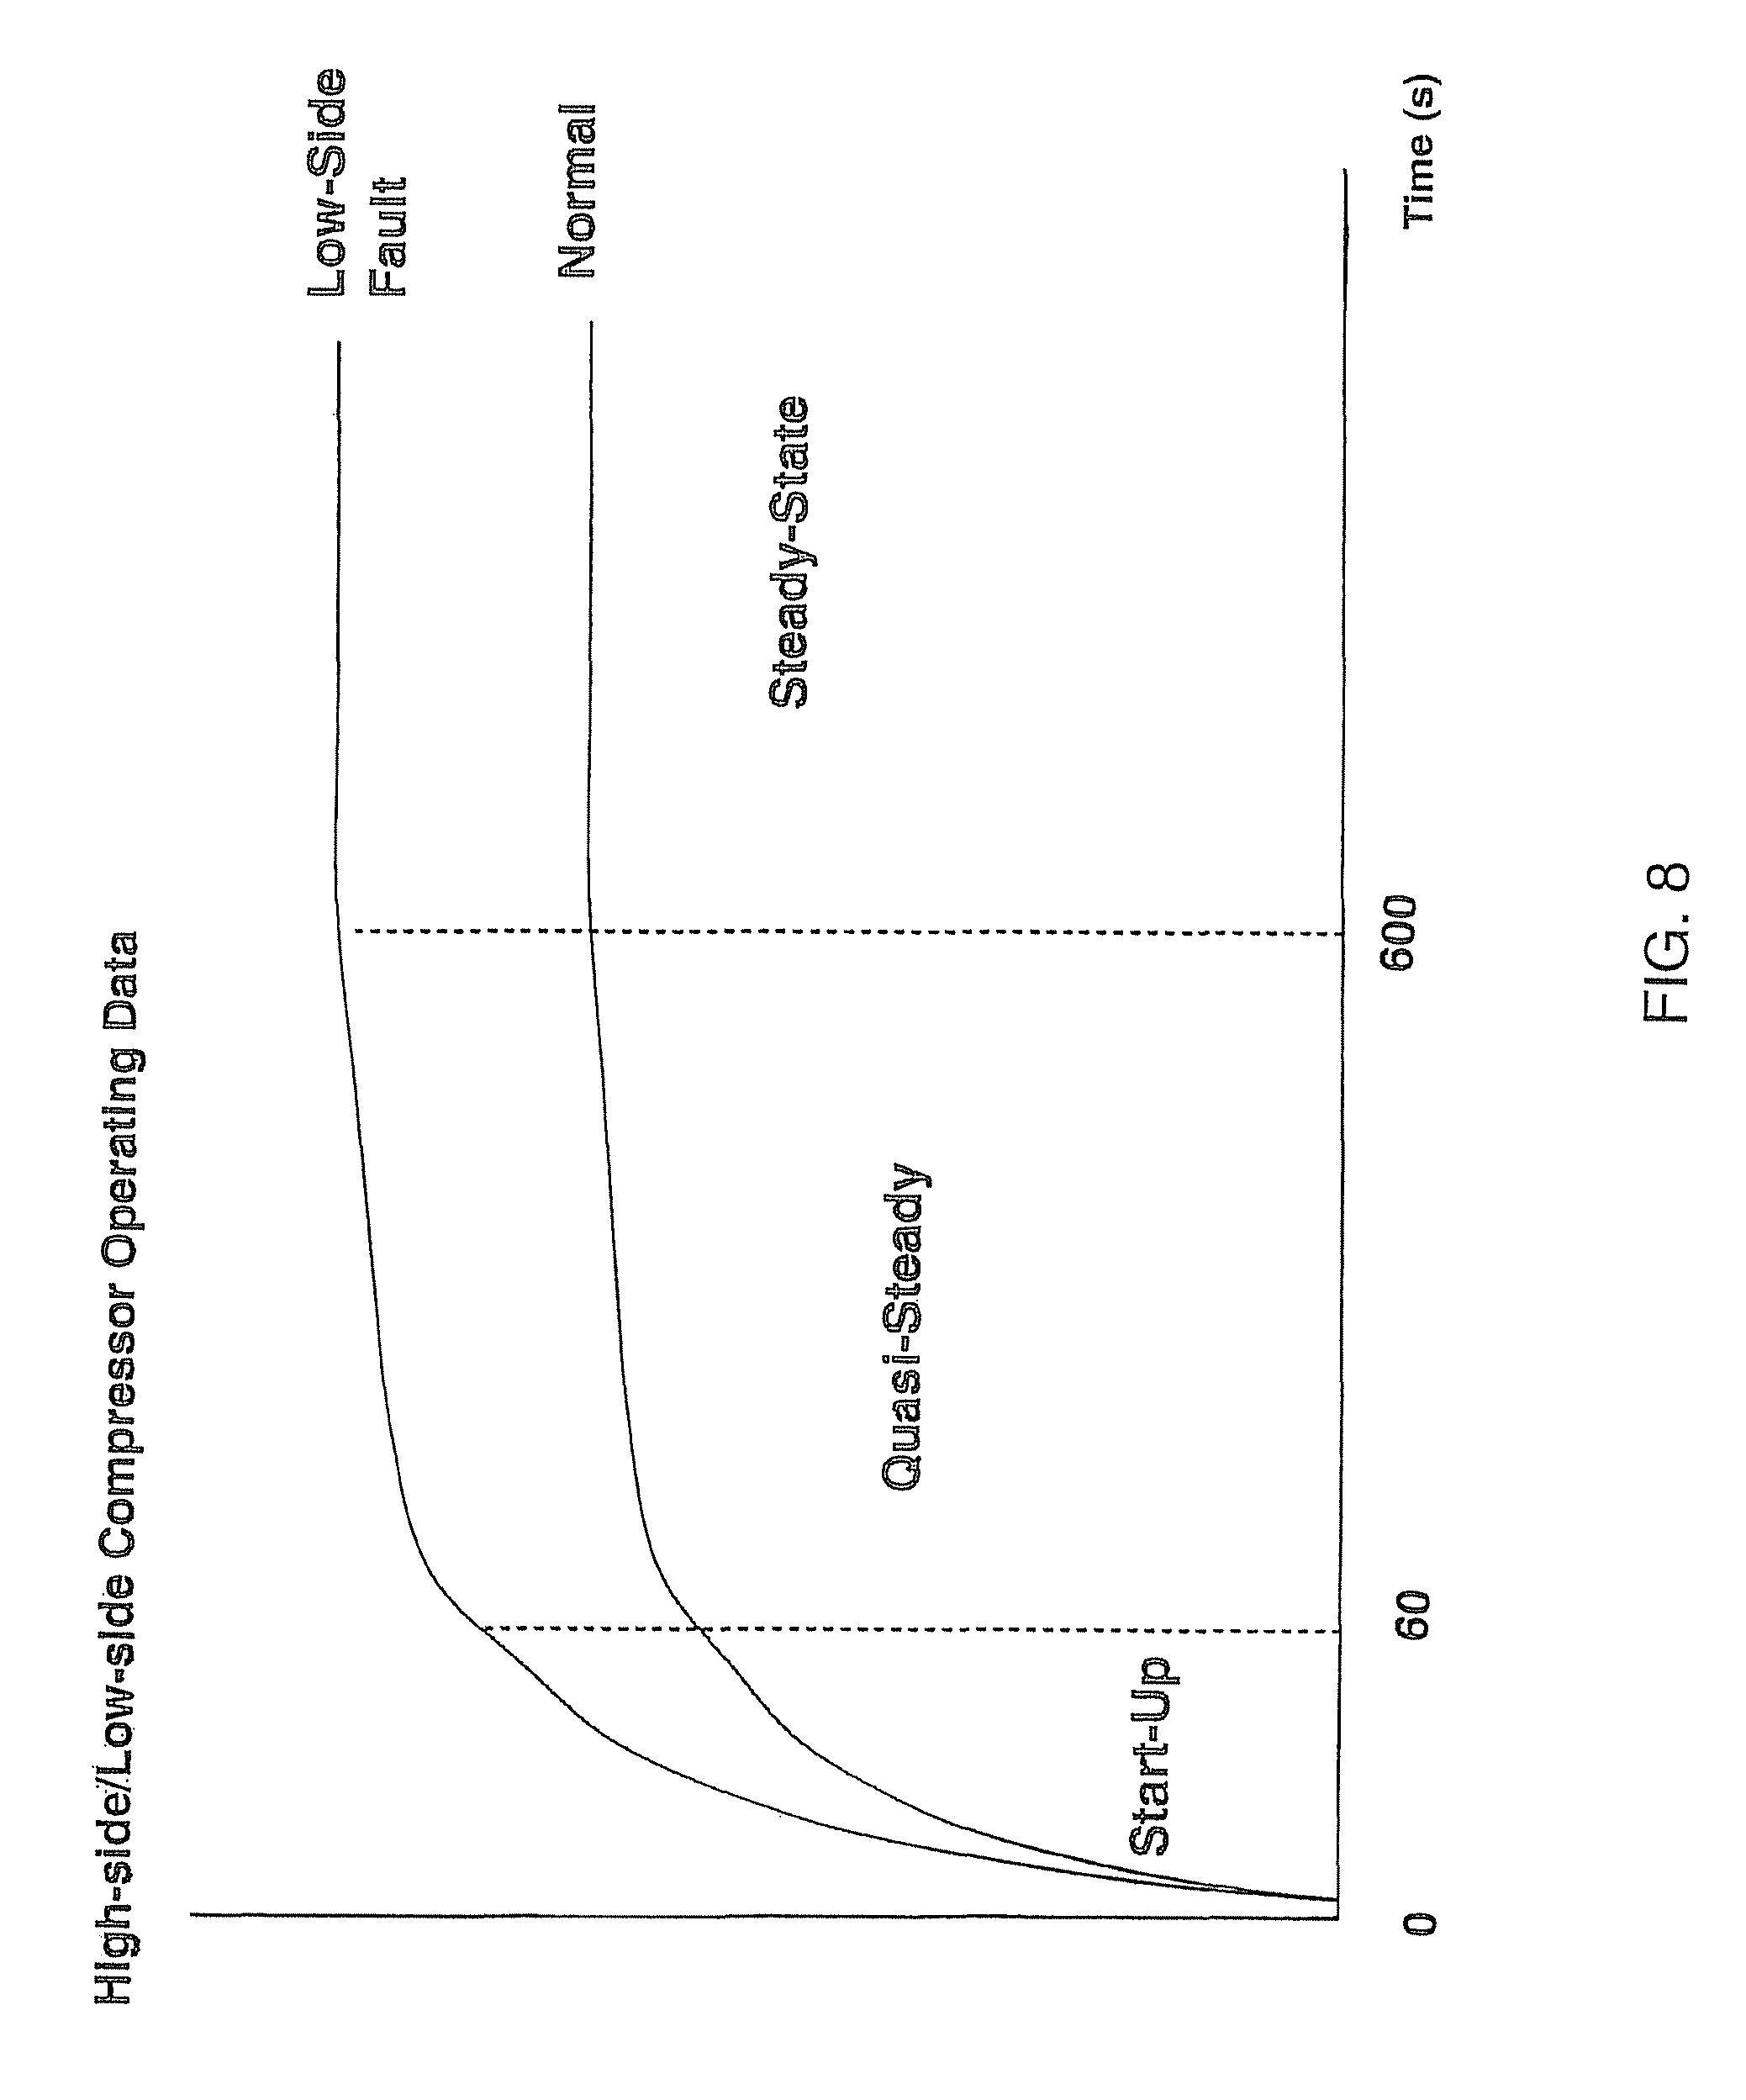 wiring diagram 220 volt campbell hausfeld marley thermostat wiring diagram 220 volt